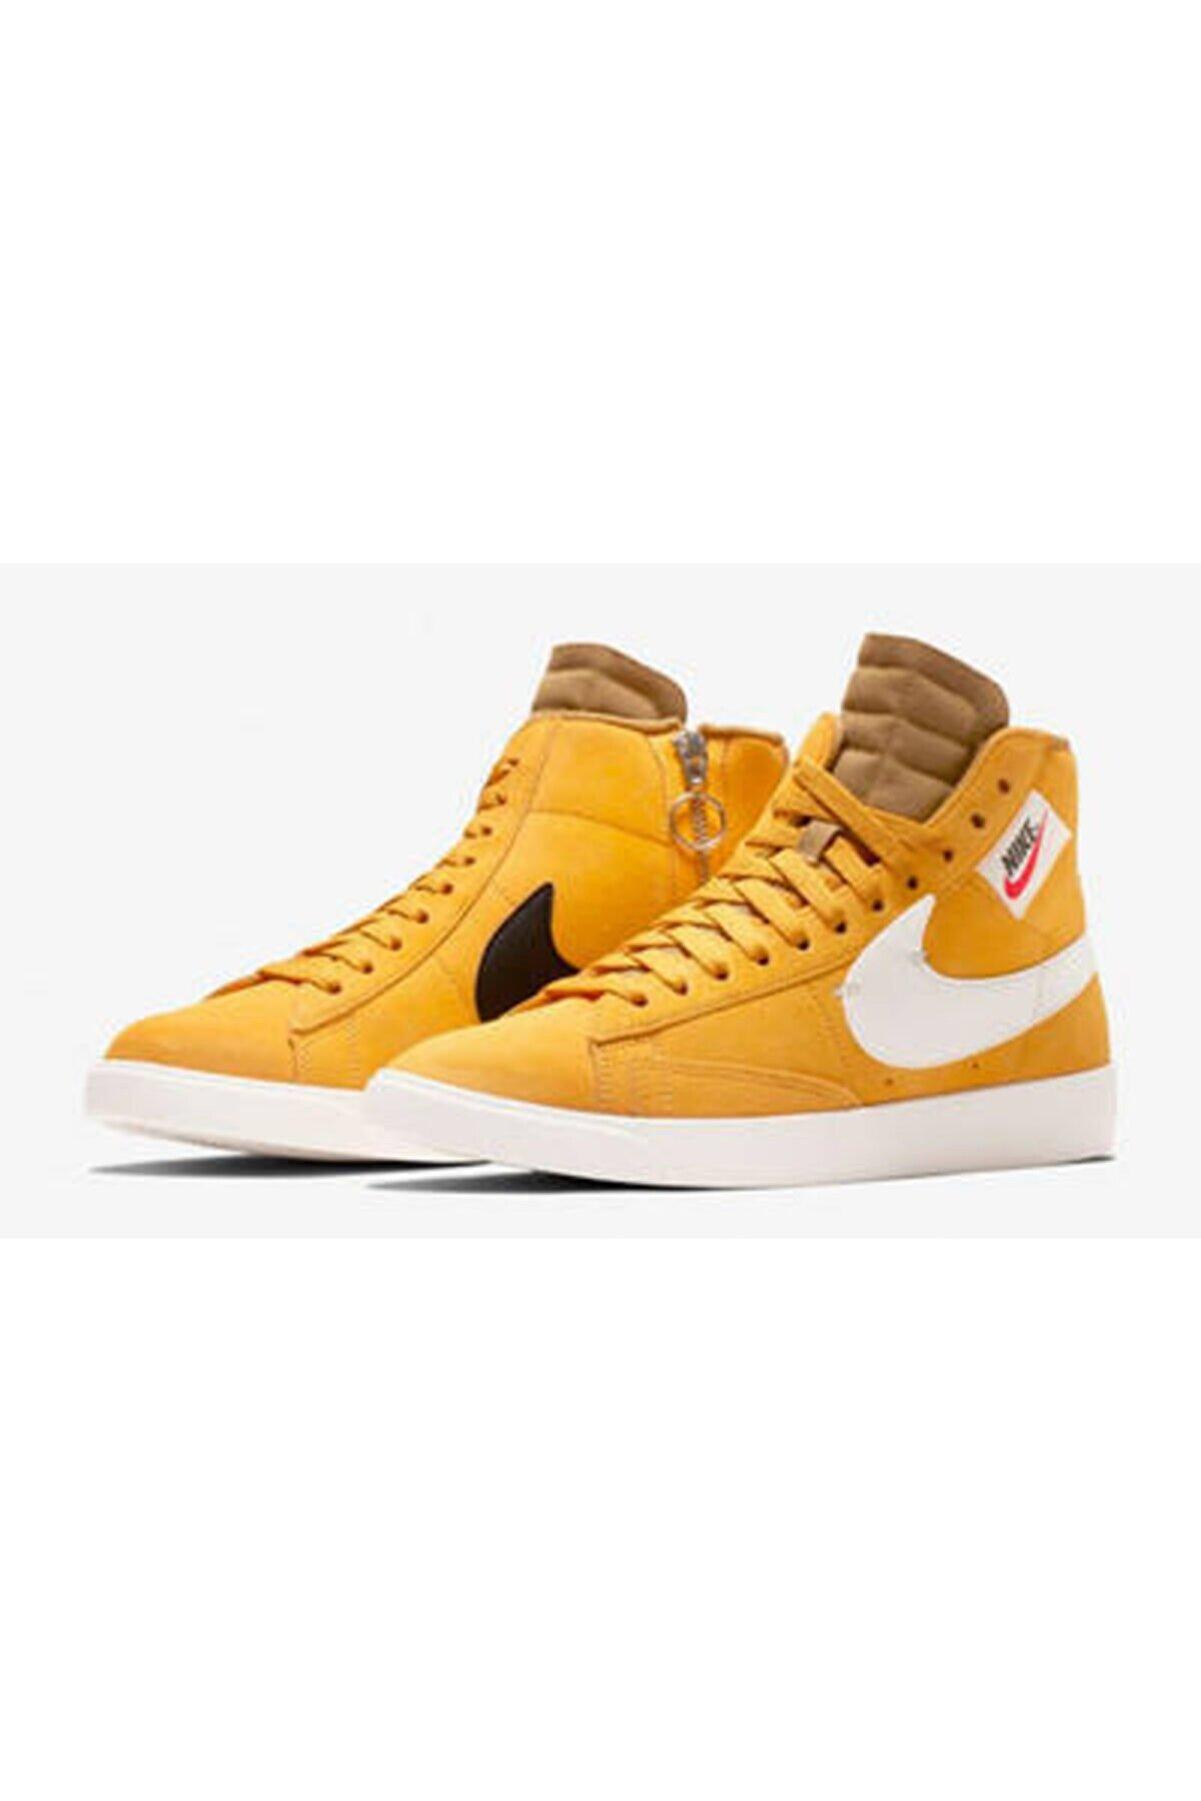 Nike Blazer Mid Rebel Spor Ayakkabı Bq4022-700